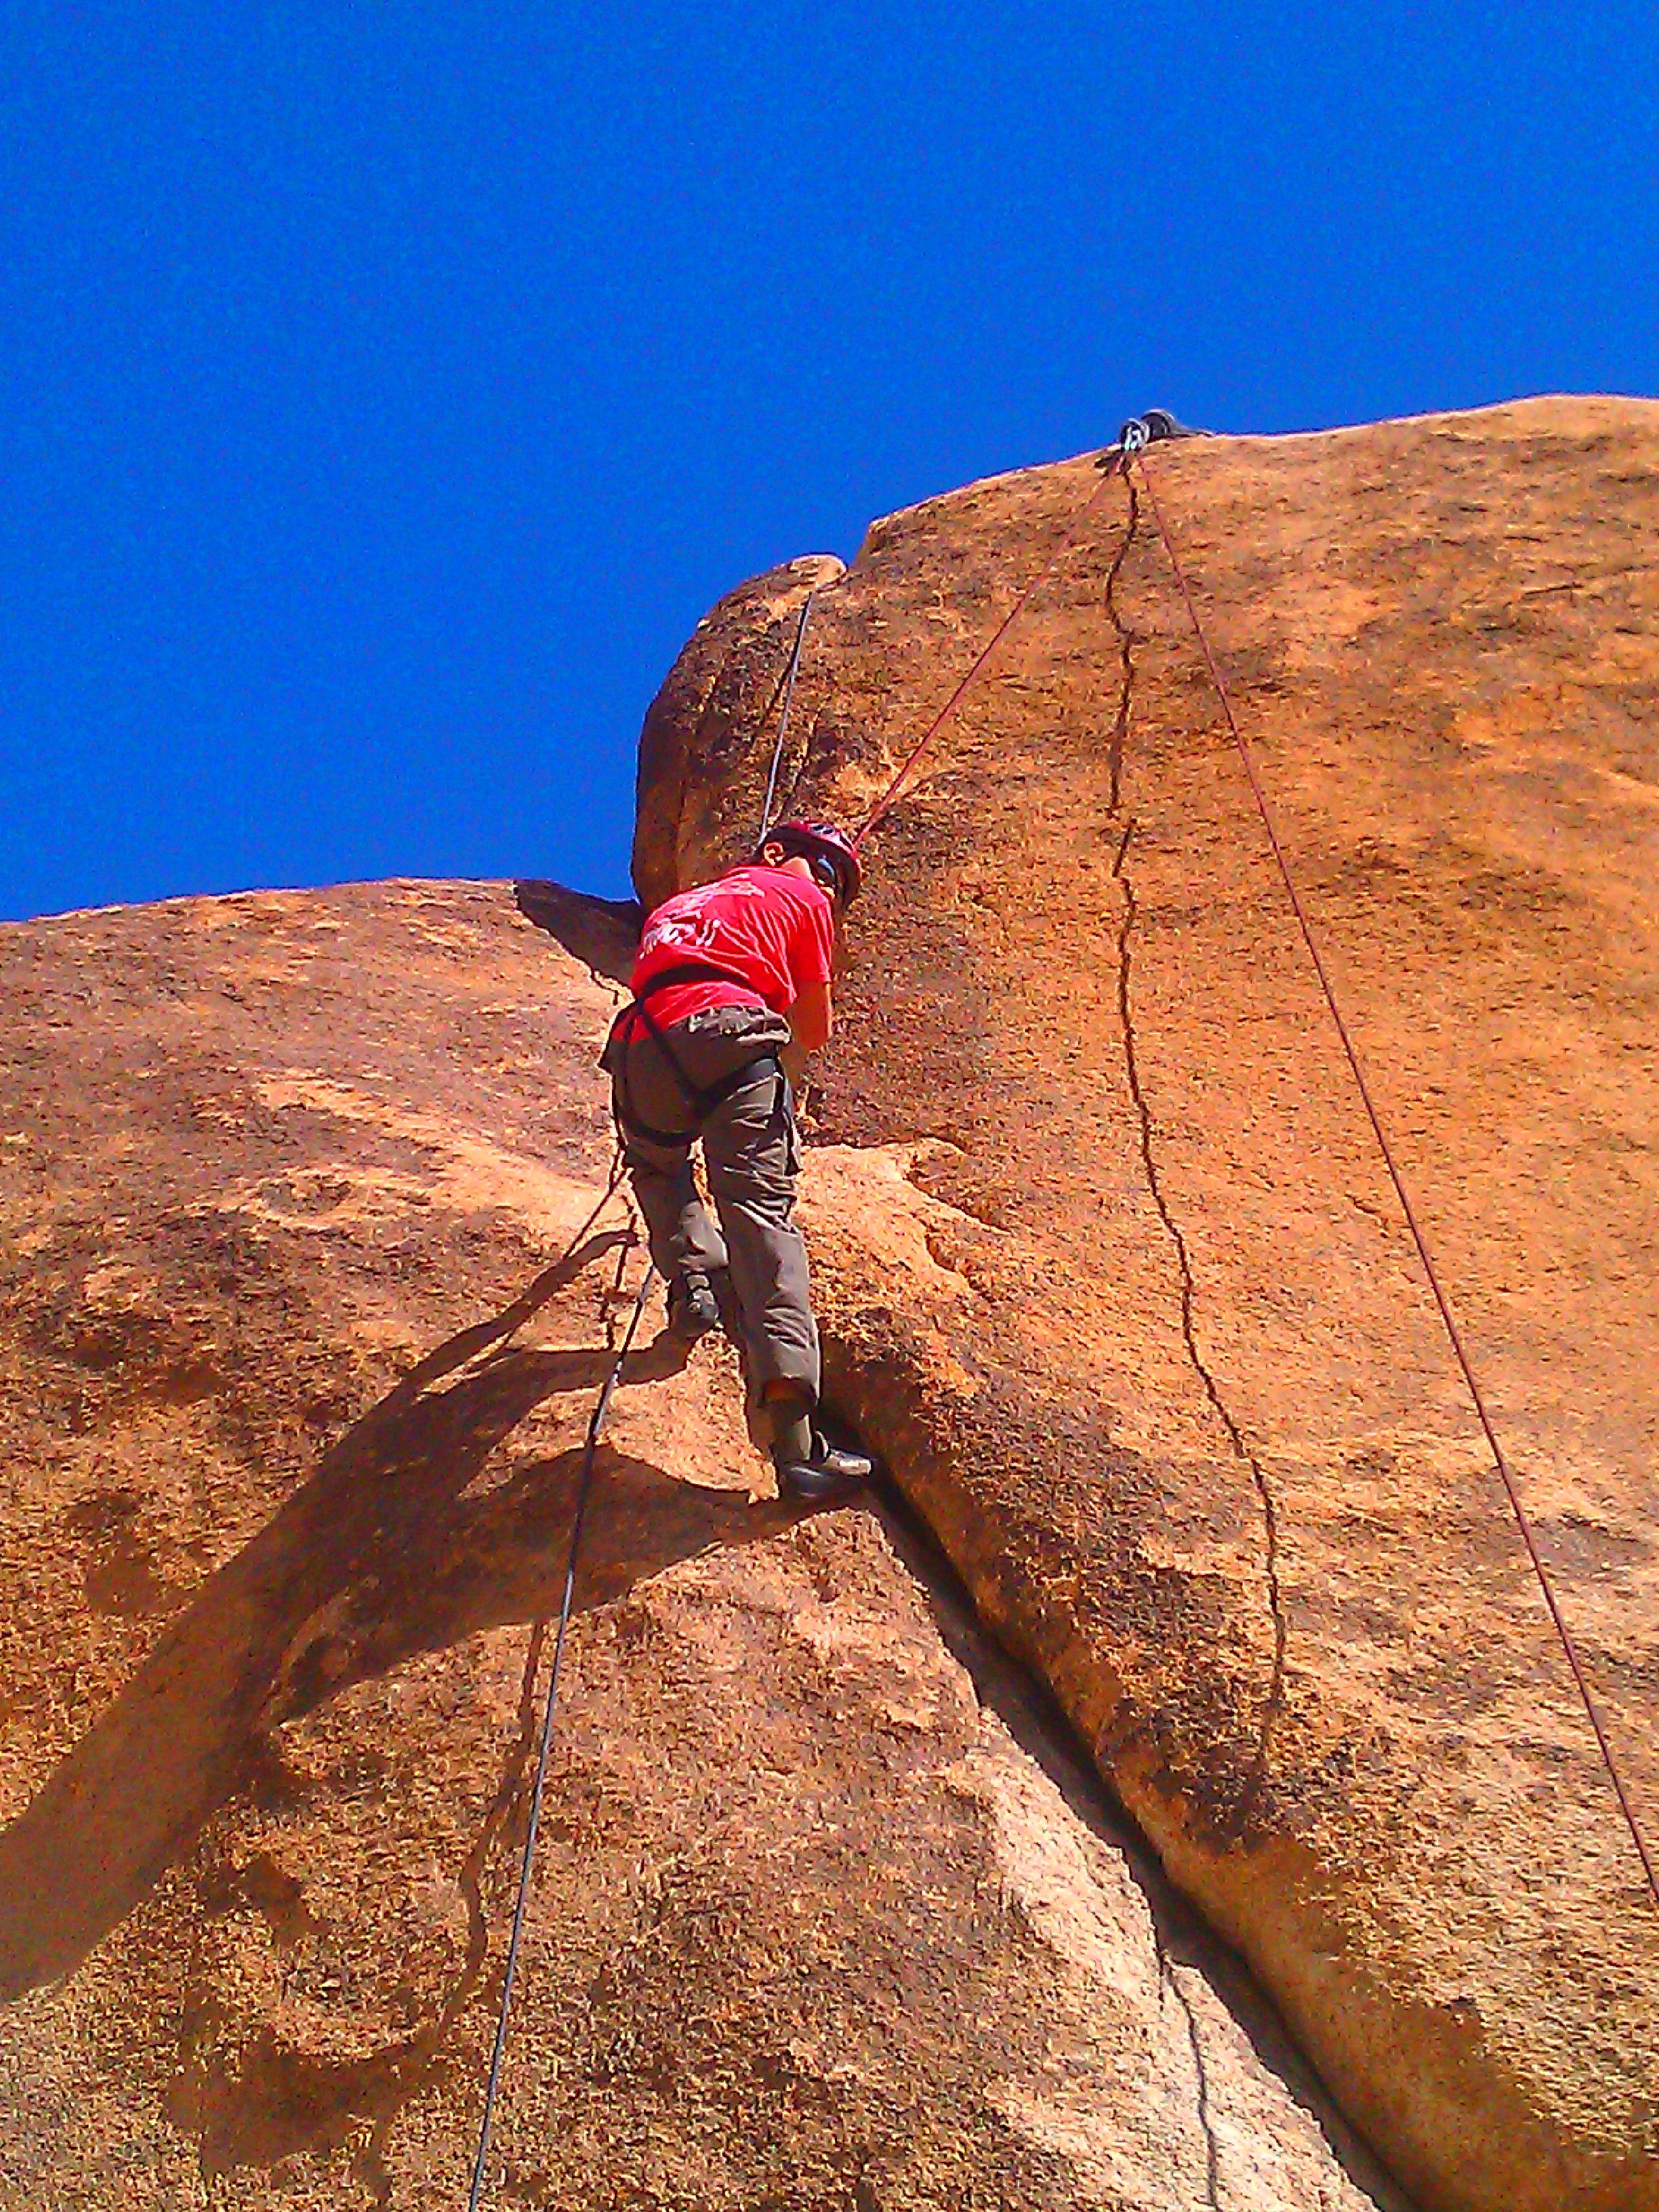 Rocking climbing tough